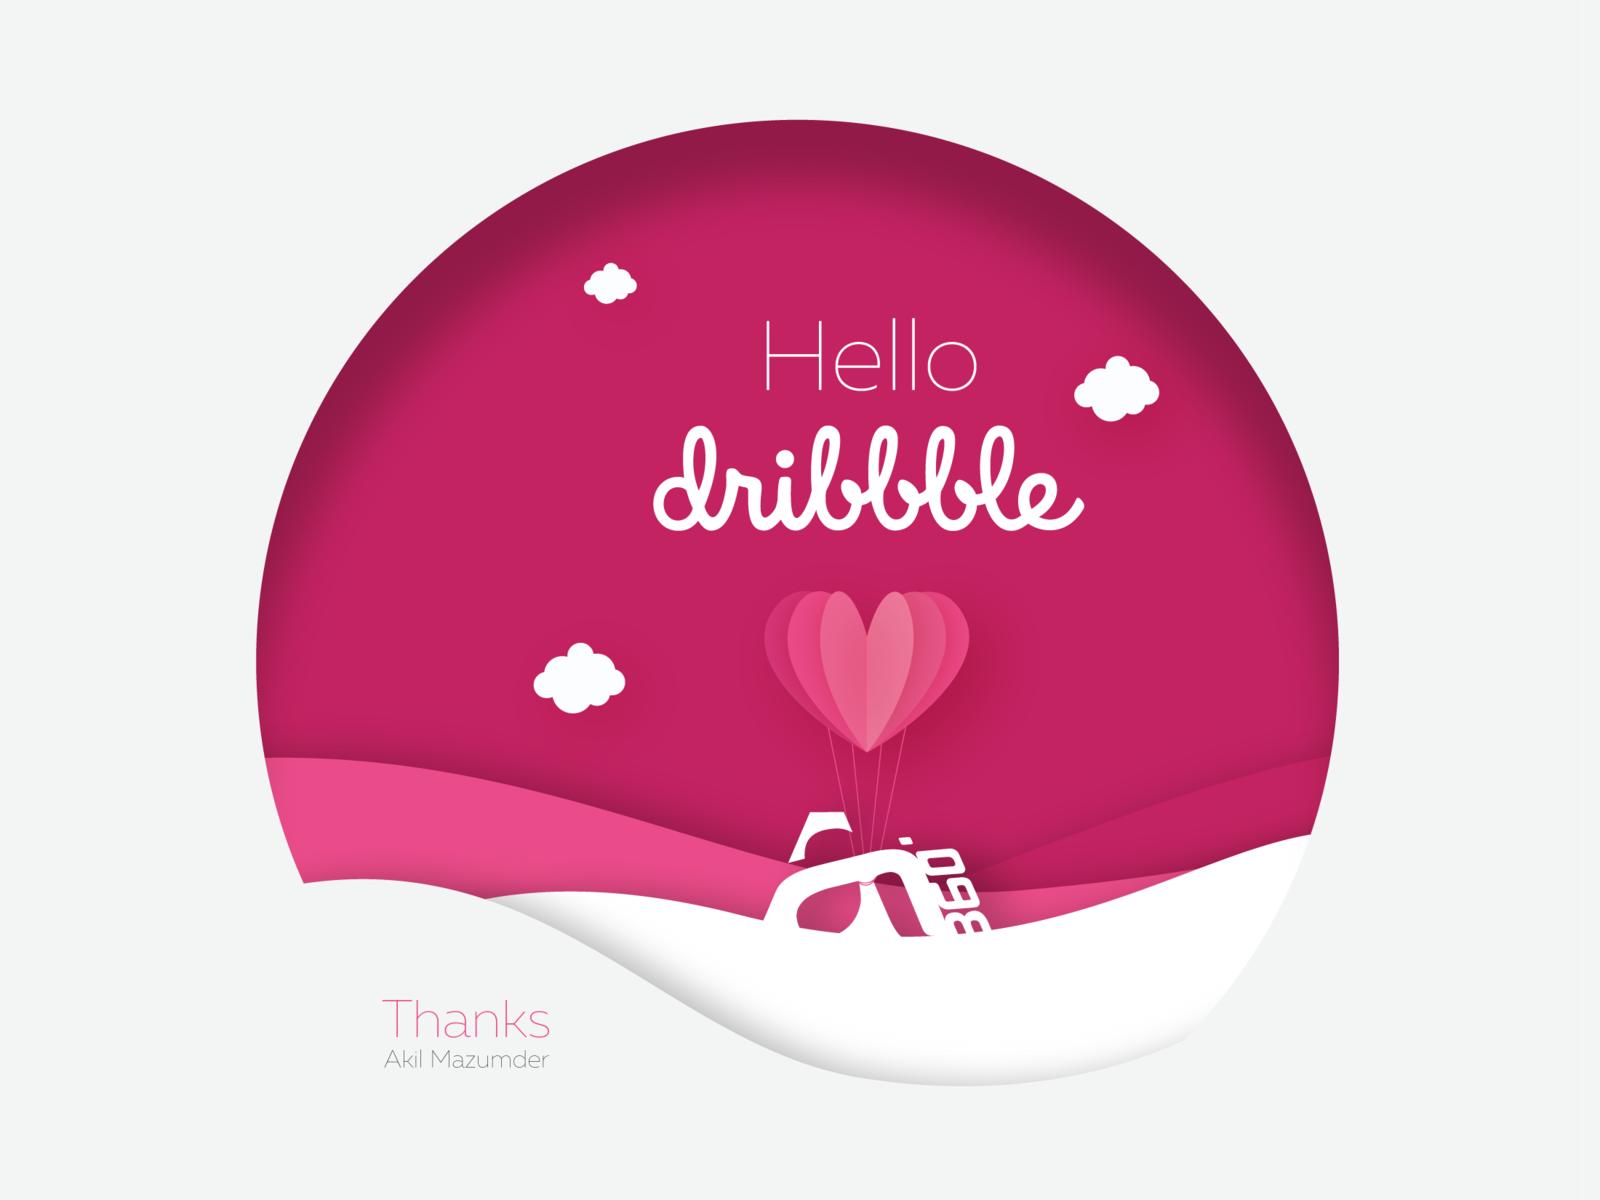 Hello Dribbble! dribbble shot dribbble best shot invitation wave balloon cloud hello aam360 hello dribbble aam360logo vector logo design illustration aam icon aam360